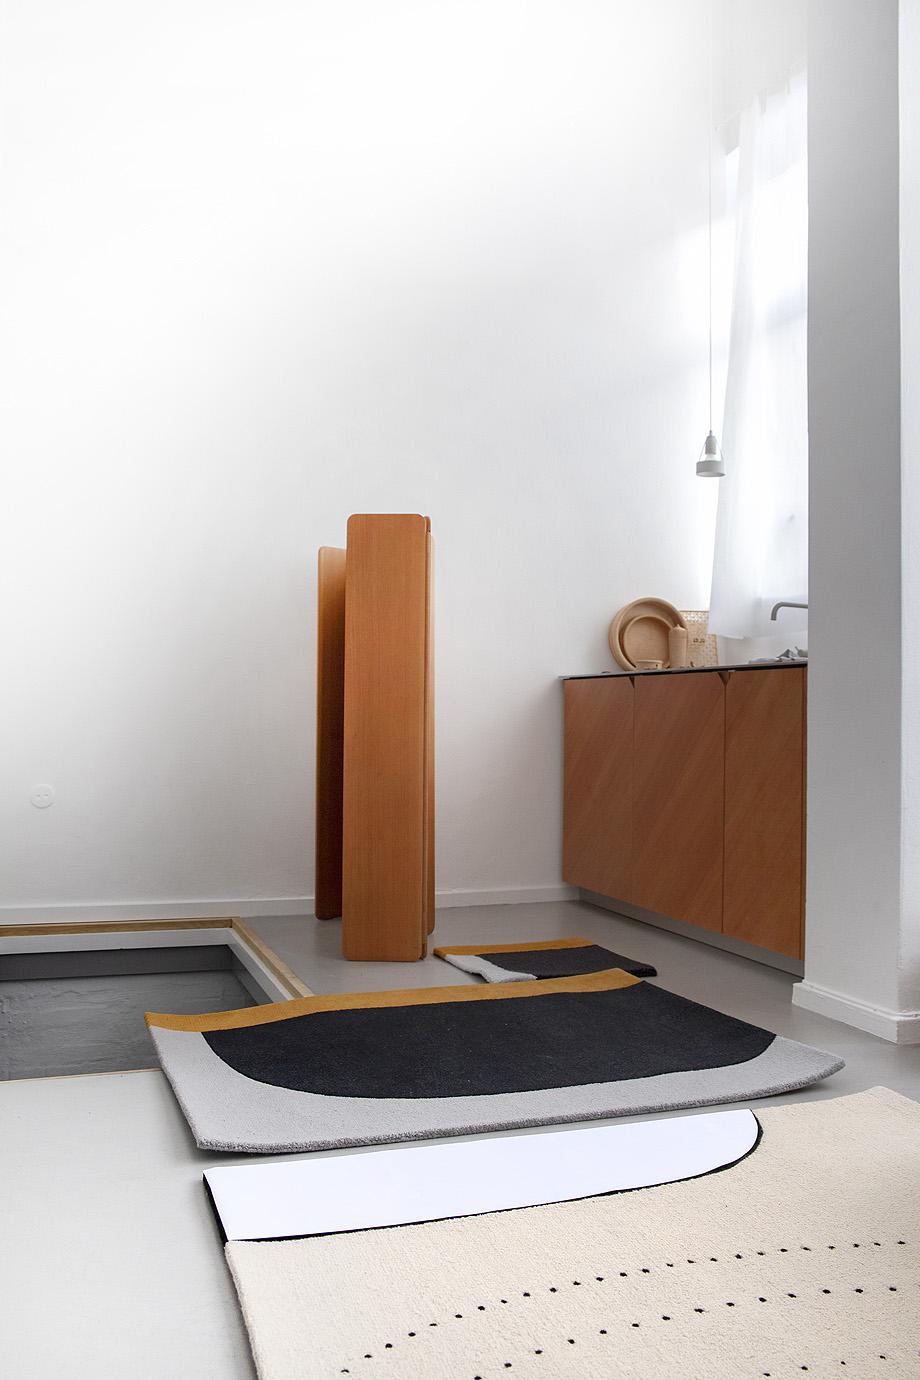 alfombras de cecilie manz para fritz hansen (1)